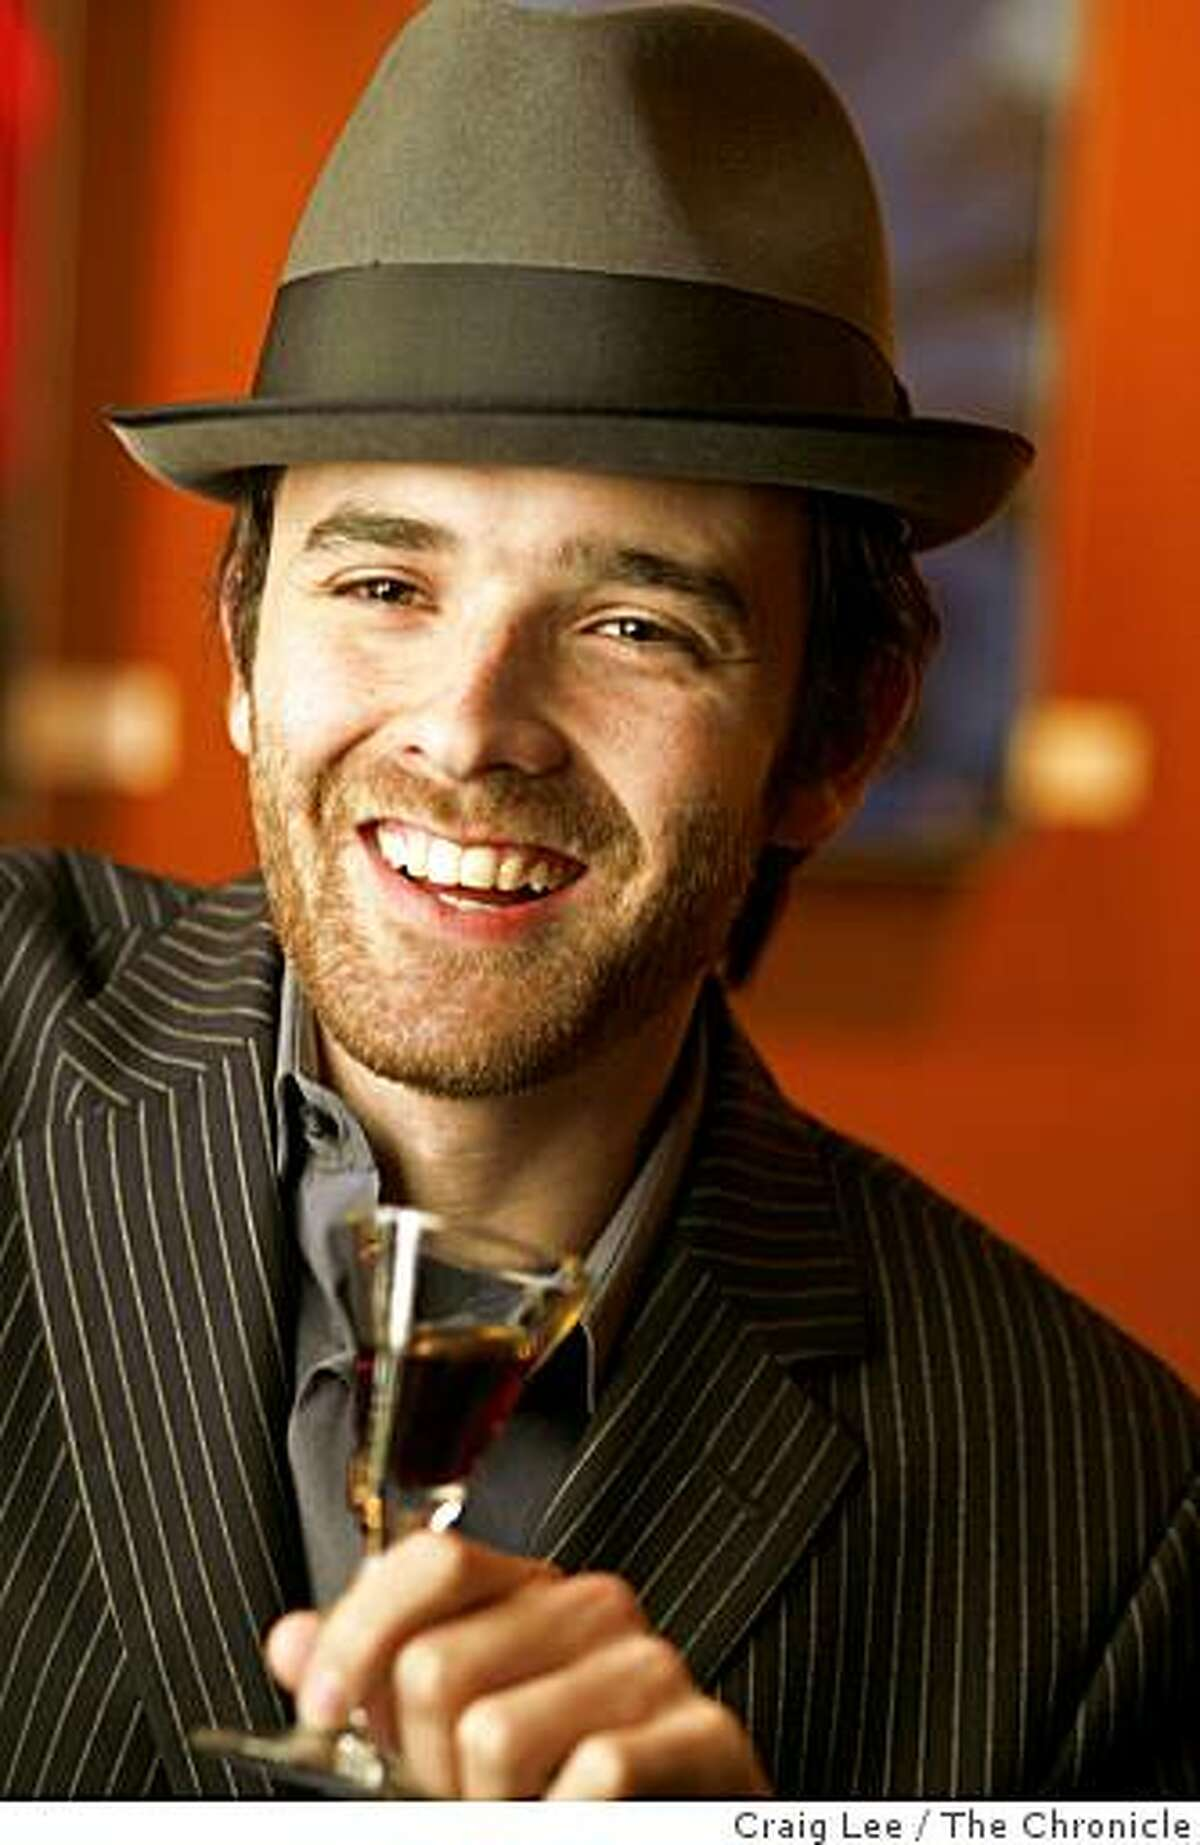 Daniel De Winter, tasting a drink of Fernet-Branca amaro at Catina bar, 580 Sutter street in San Francisco on March 31, 2008.